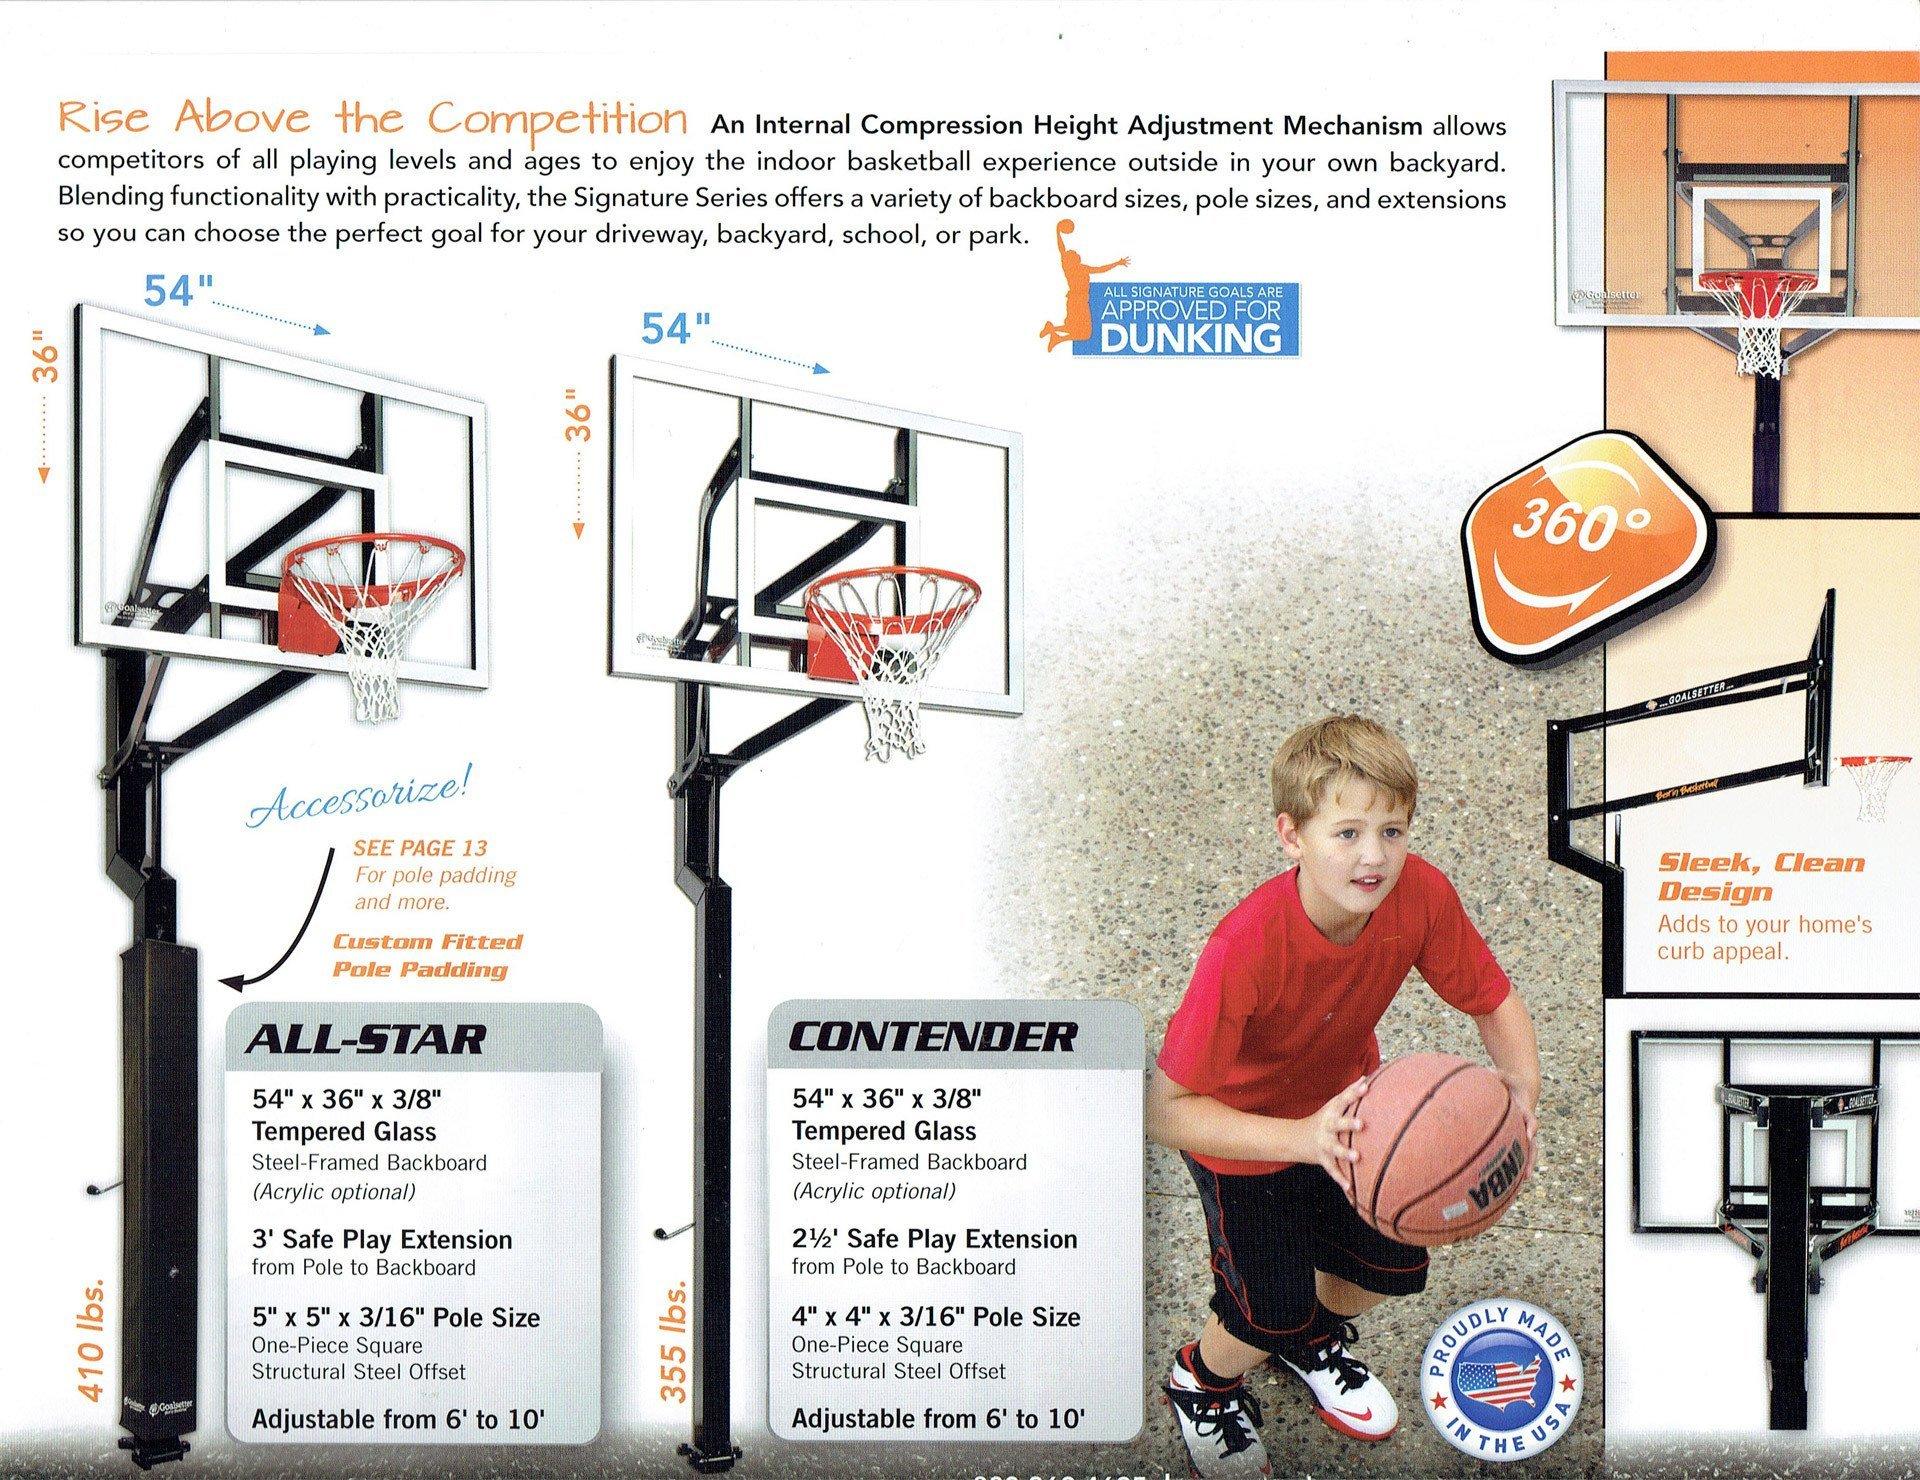 goalsetter basketball systems height adjustment mechanism - Wood Kingdom East - Coram, Long Island, Medford, The Hamptons